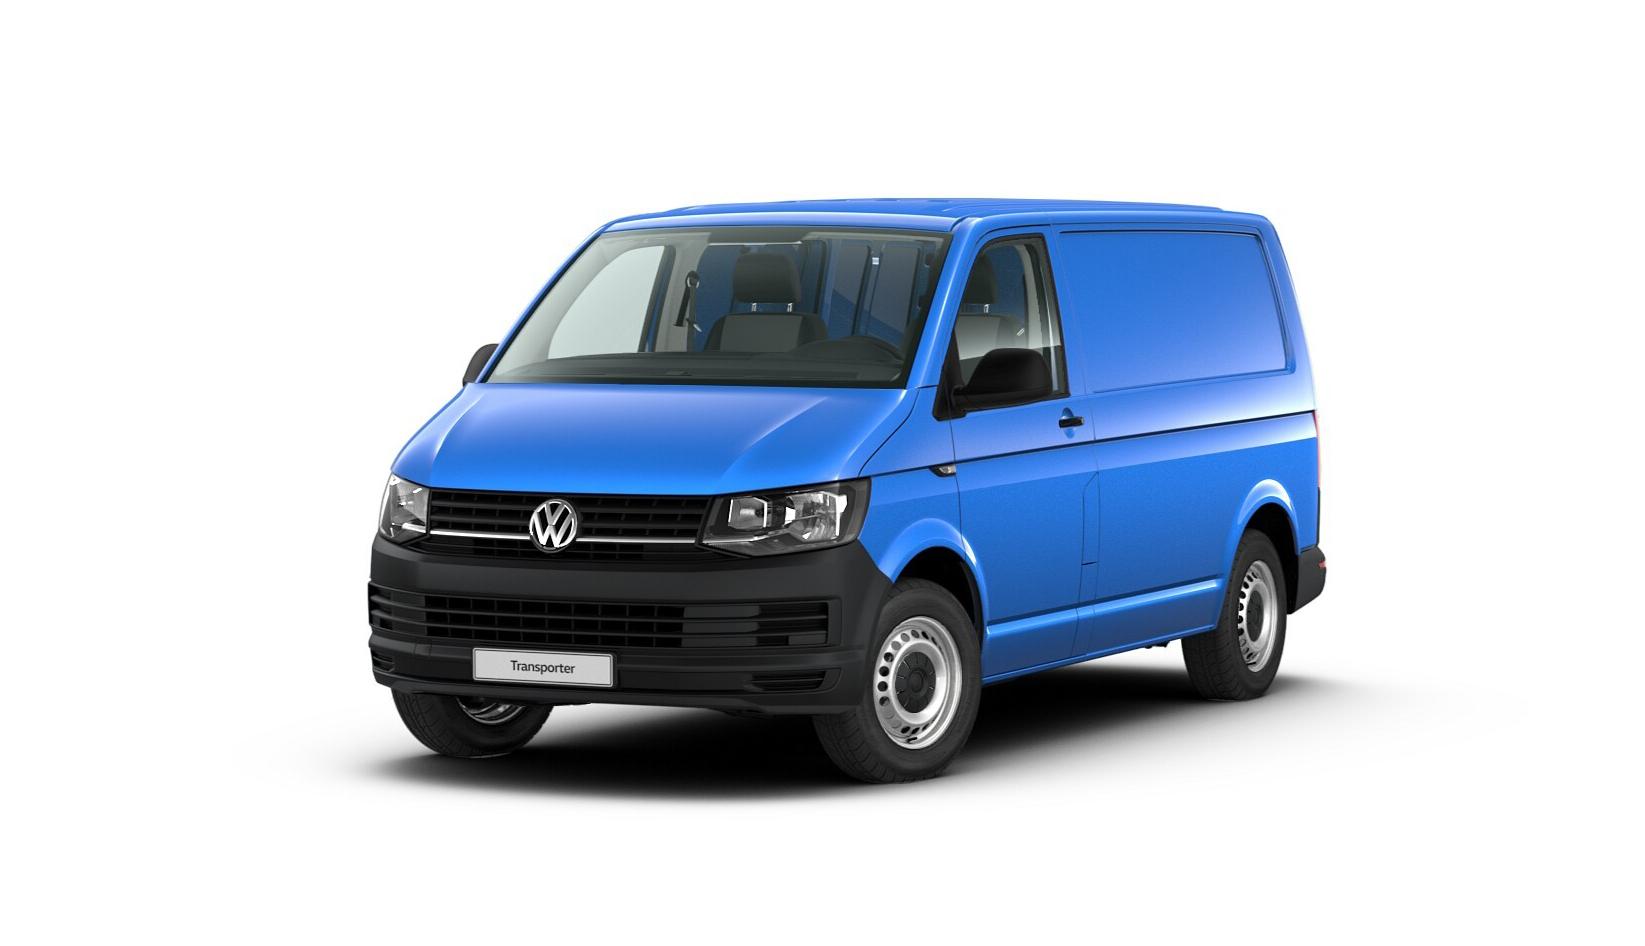 "Transporter Kasten ""EcoProfi"" Motor: 2,0 l TDI EU6 SCR BlueMotion Technology 75 kW Getriebe: 5-Gang-Schaltgetriebe Radstand: 3000 mm"